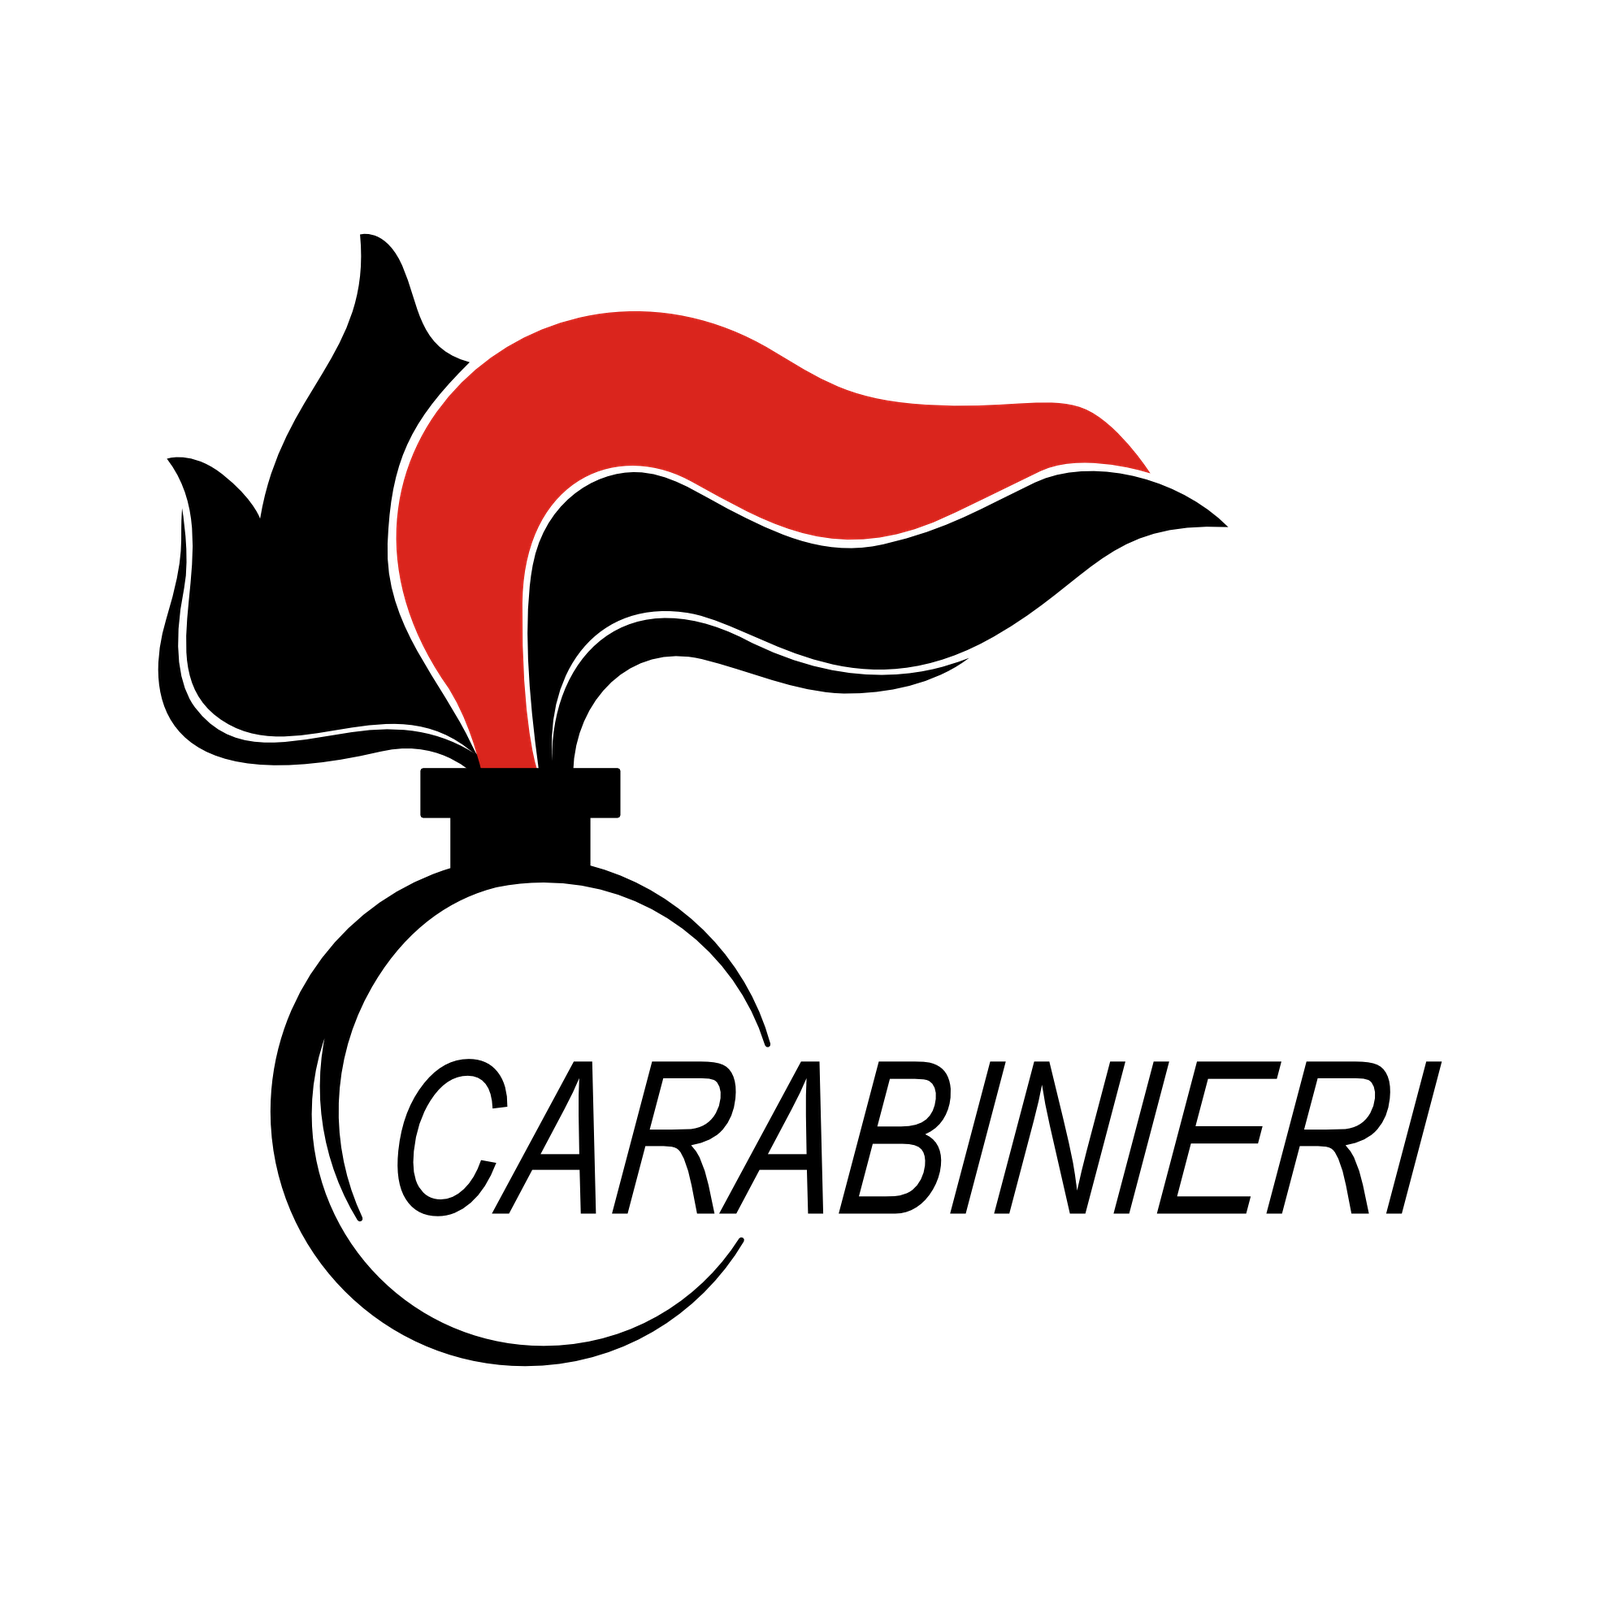 logo_carabinieri